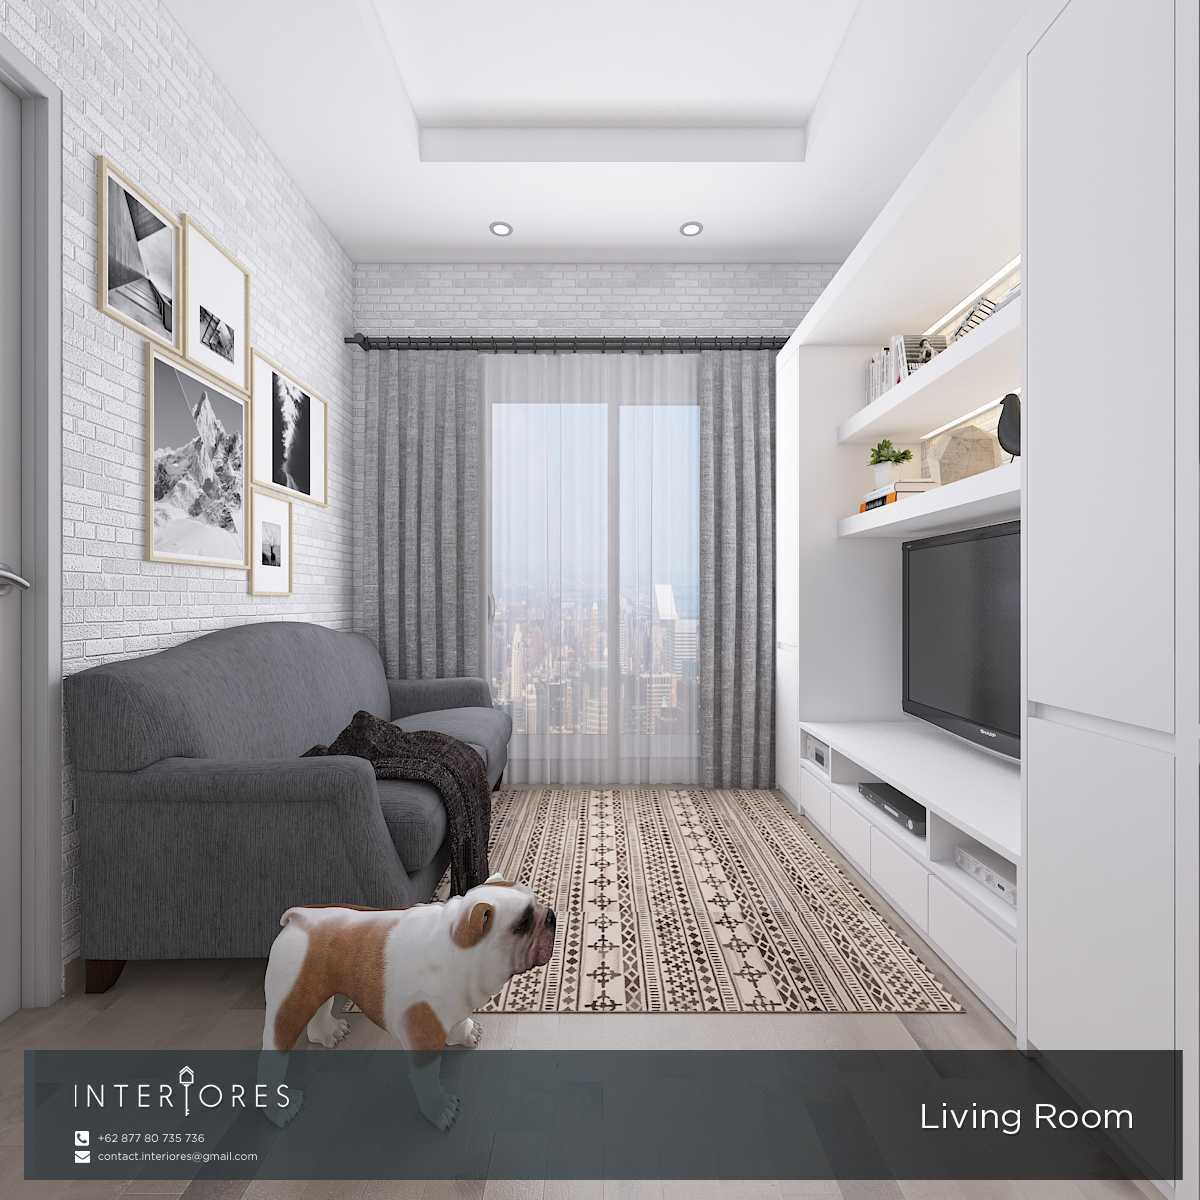 Interiores Interior Consultant & Build P. Scandi Pejaten Pejaten Living Room Modern,skandinavia  17963